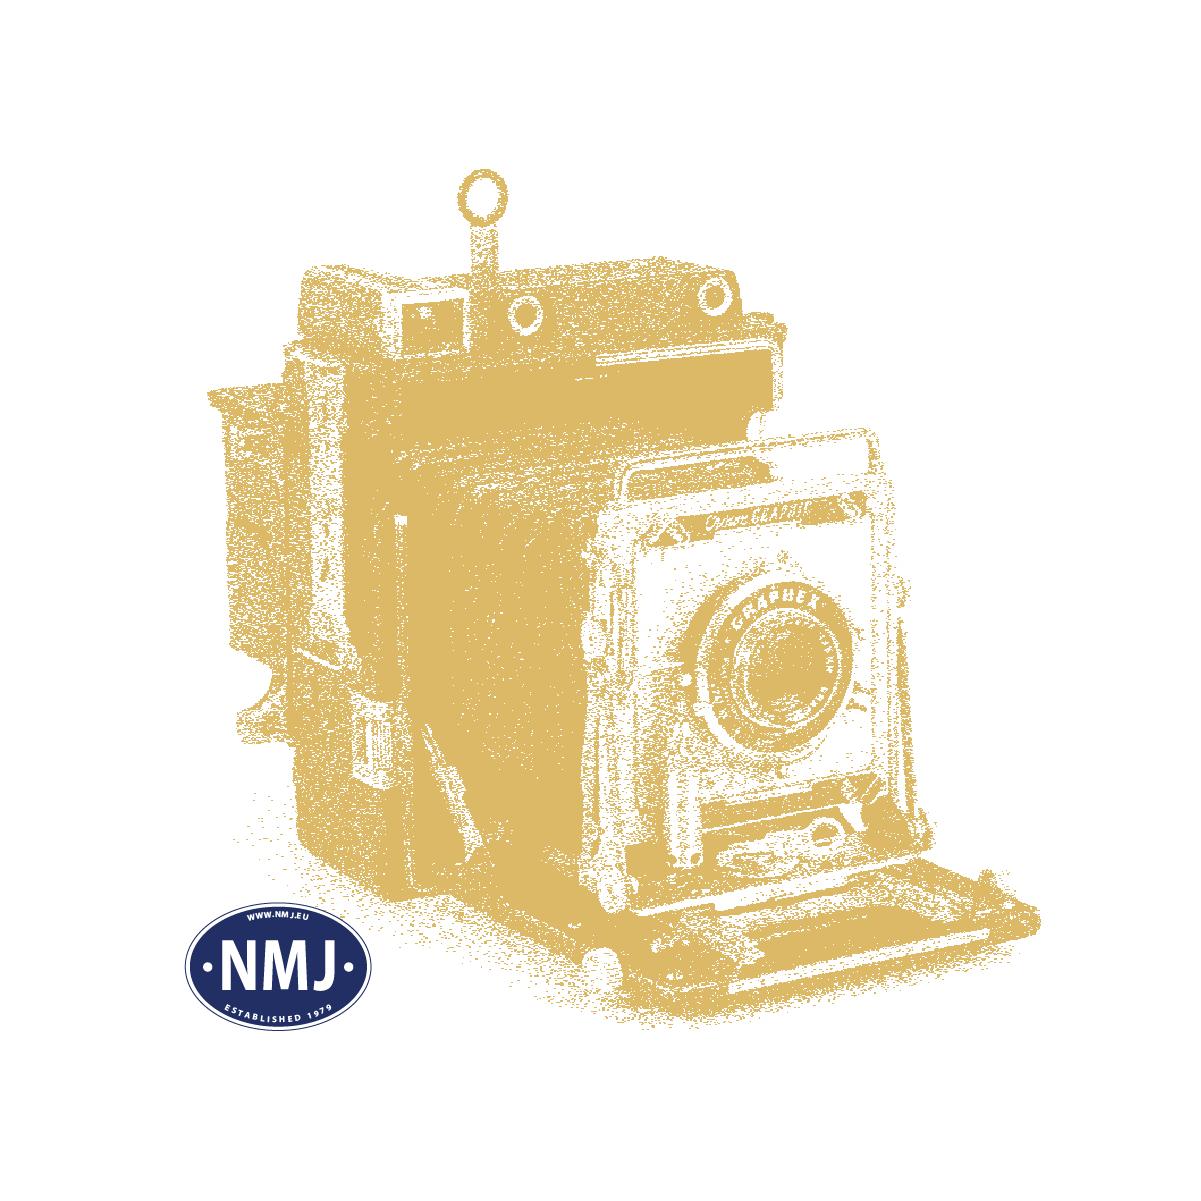 NMJT611.112 - NMJ Topline SJ Lgjns 42 74 443 4 338-3 med 25`Thermo container